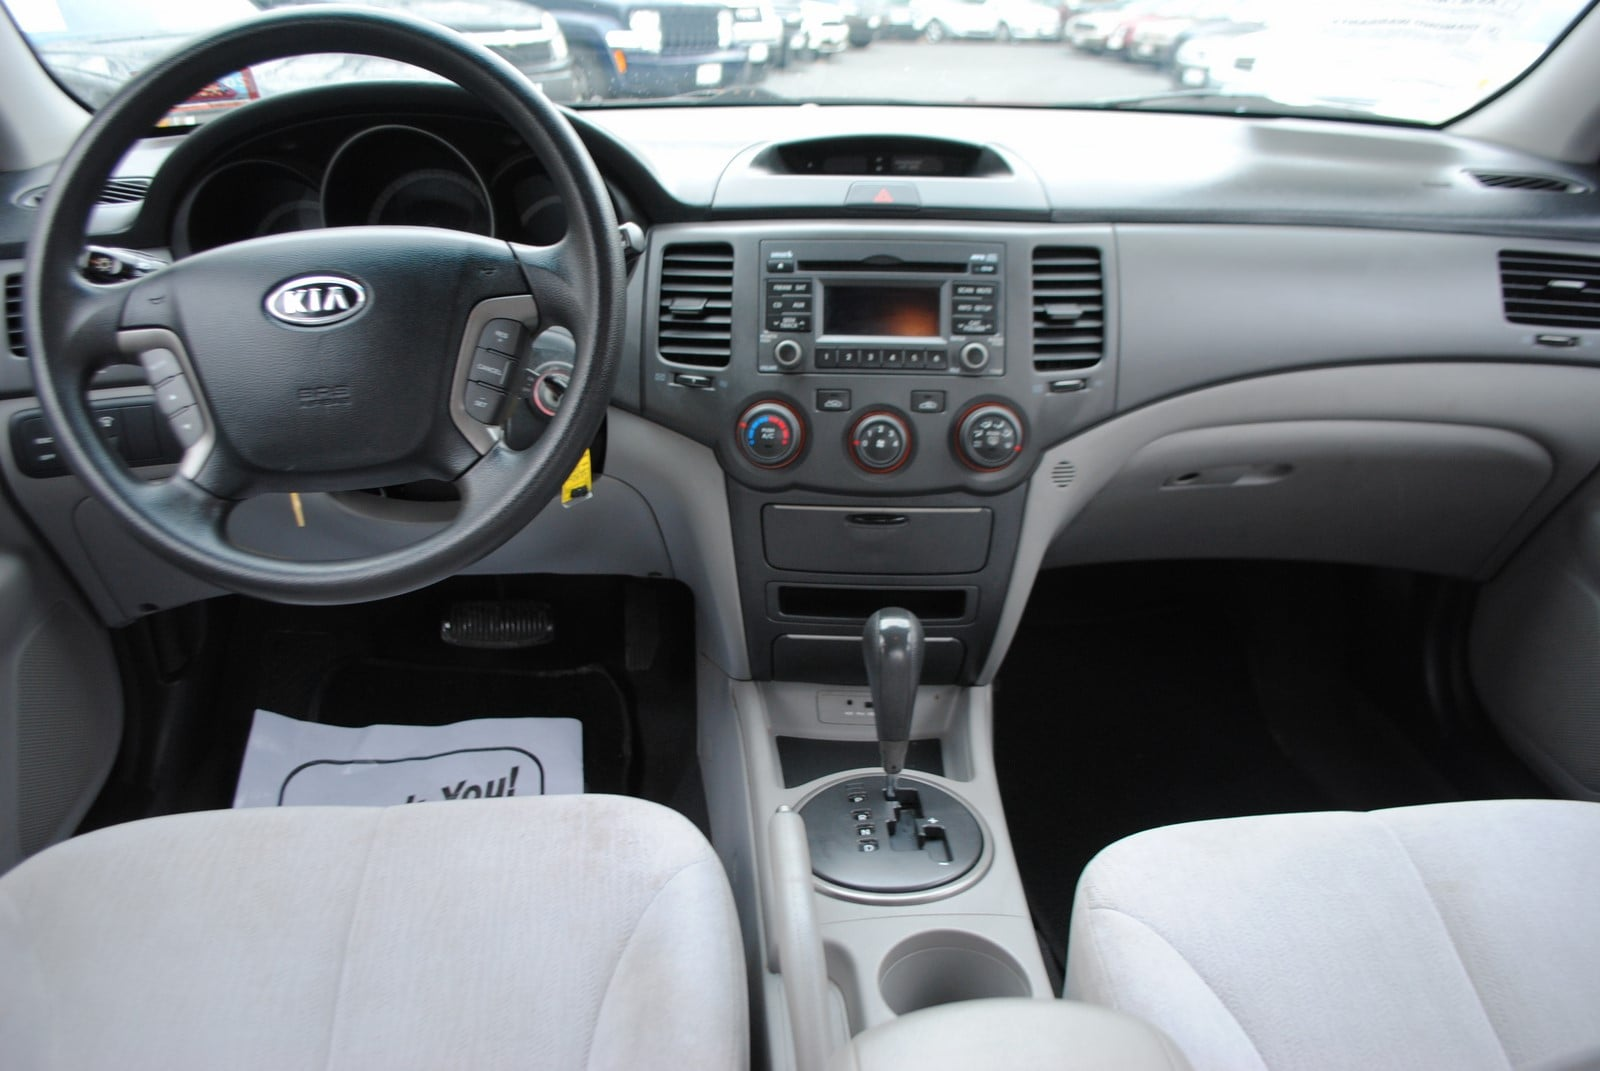 Used 2010 Kia Optima For Sale West Milford Nj